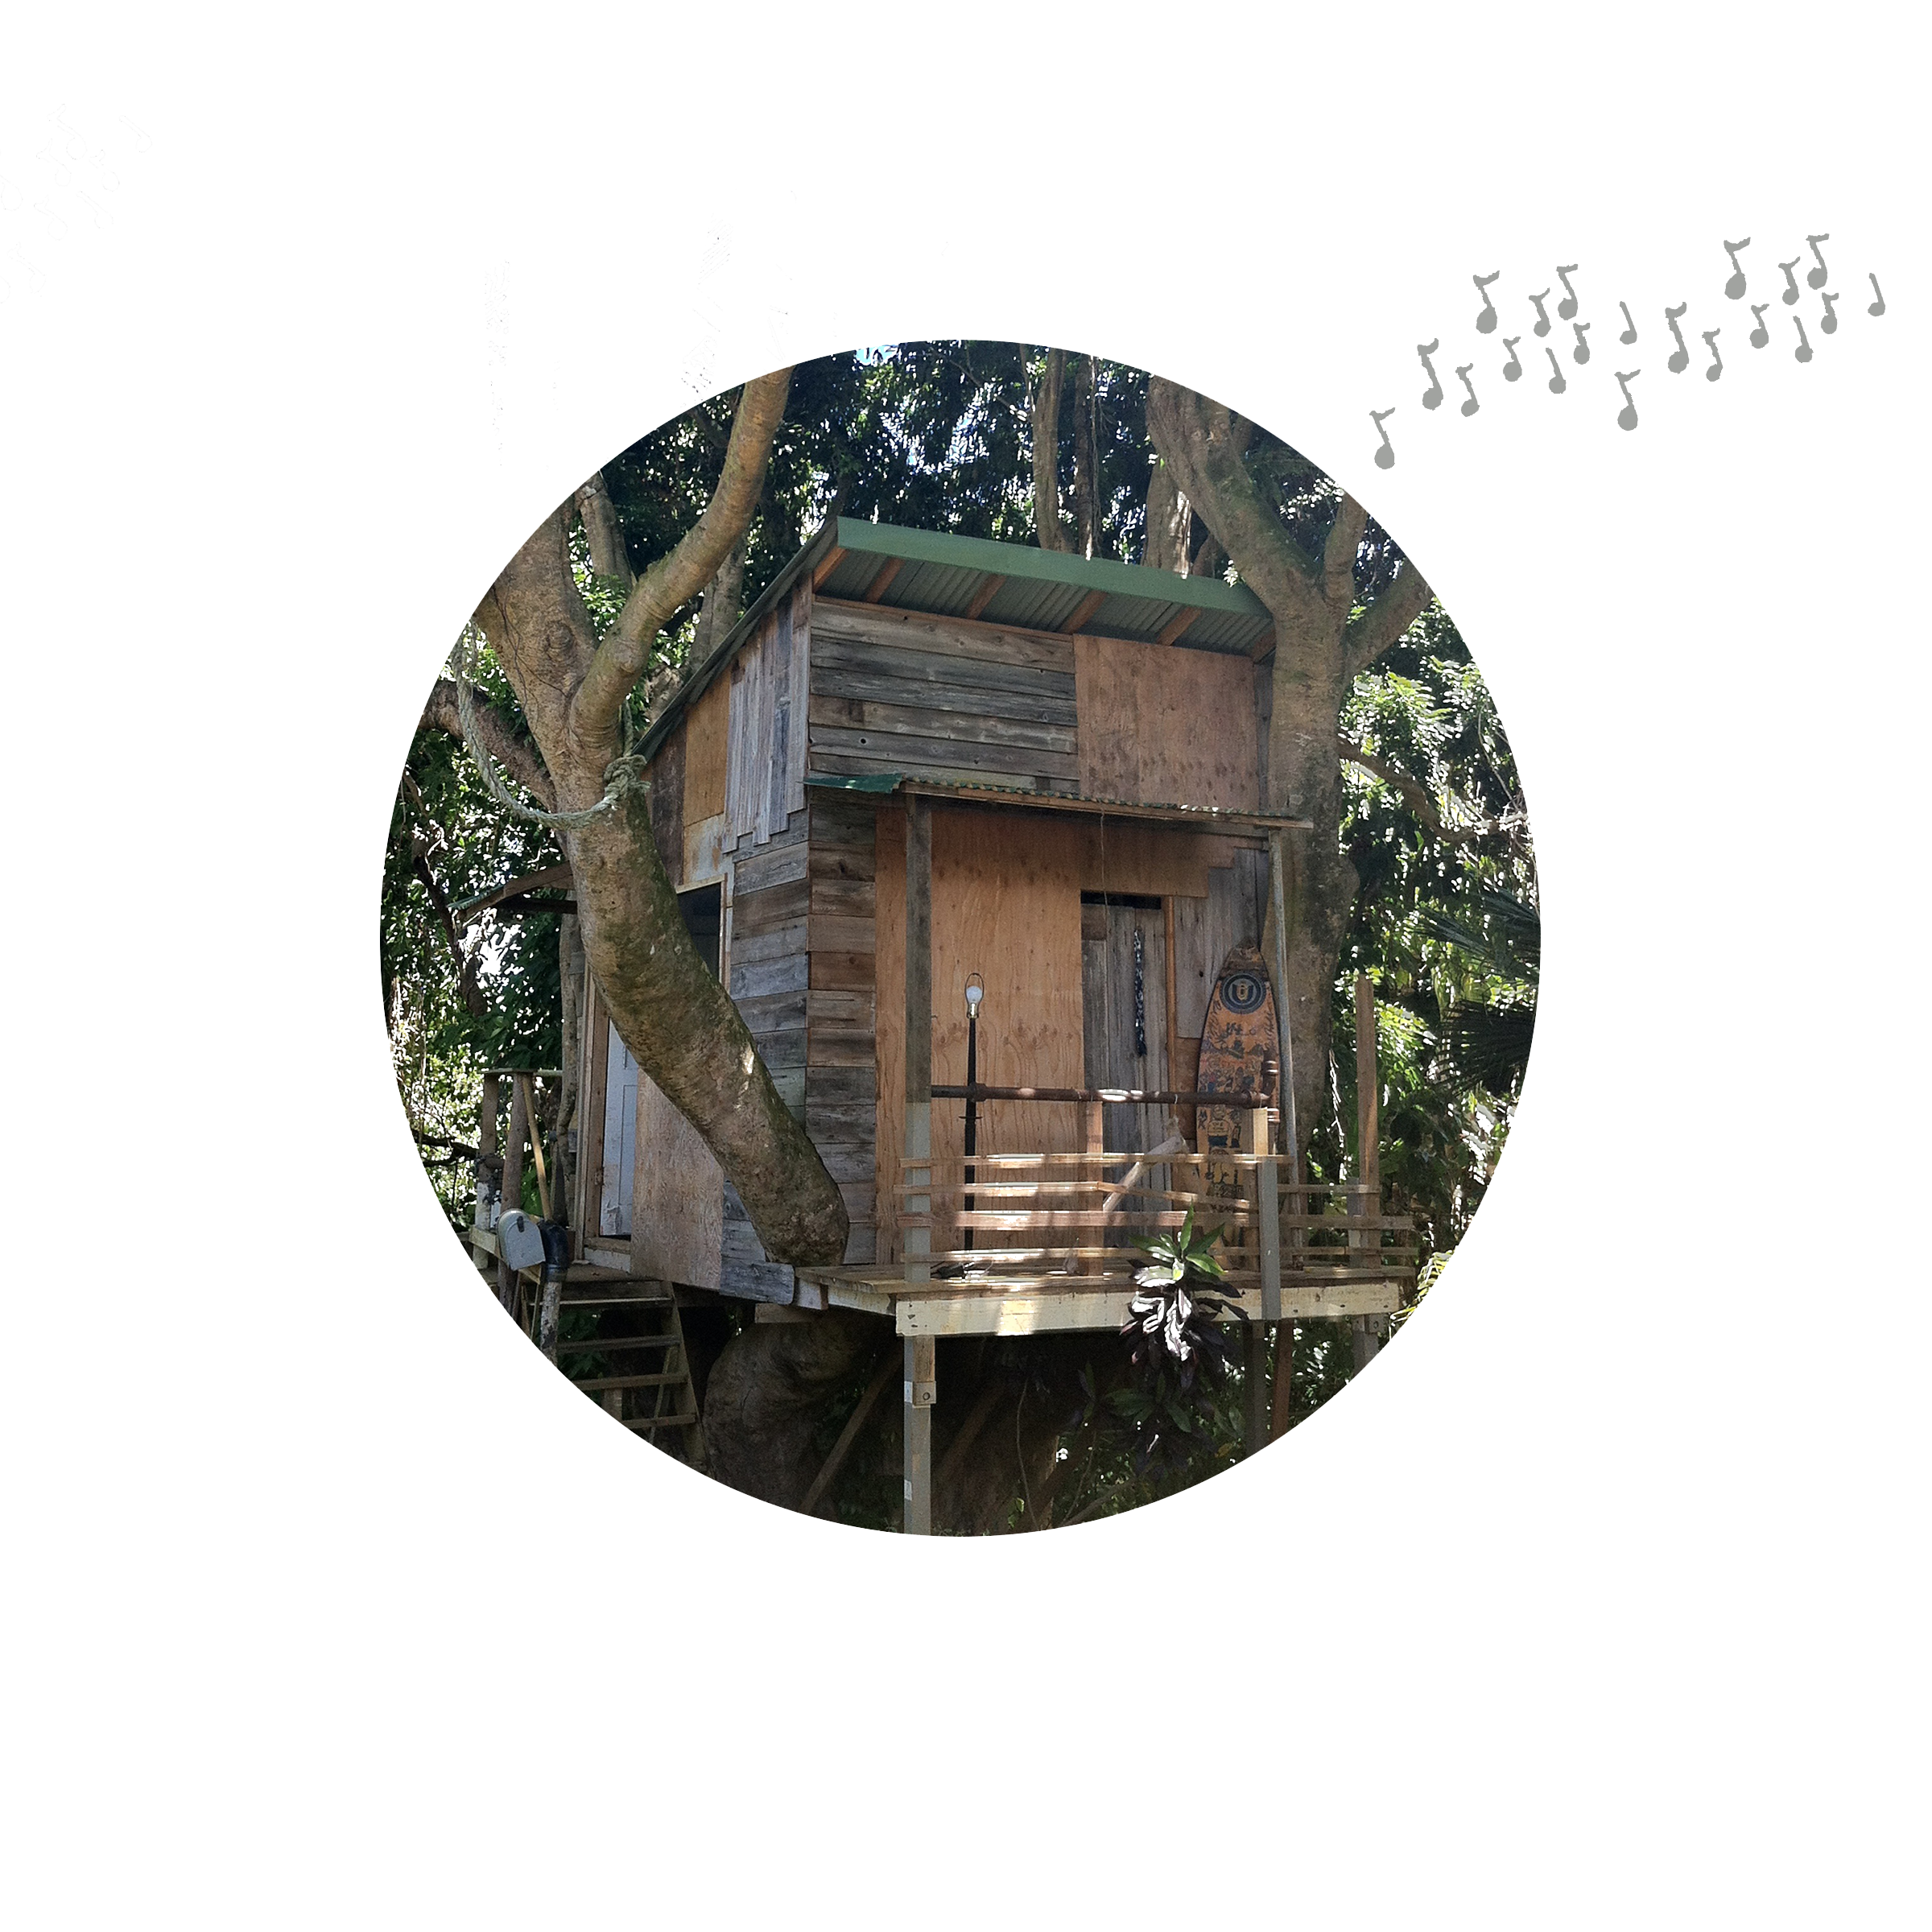 Treehousenotes.png